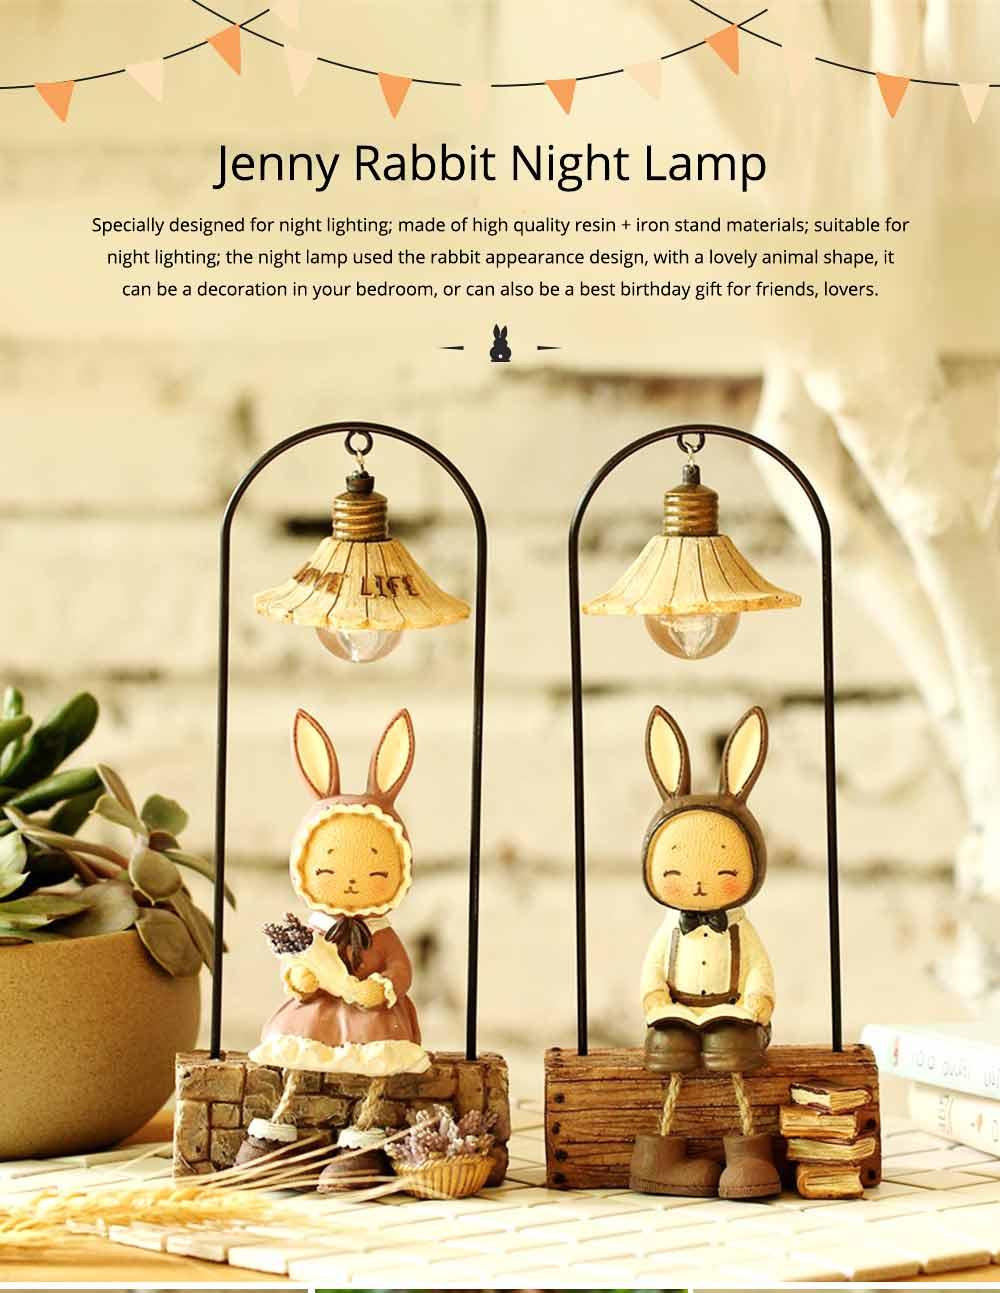 Creative Jenny Rabbit Toy Night Light, Decorative Table Lamp Birthday Gifts for Kids Baby Girls Boys 6